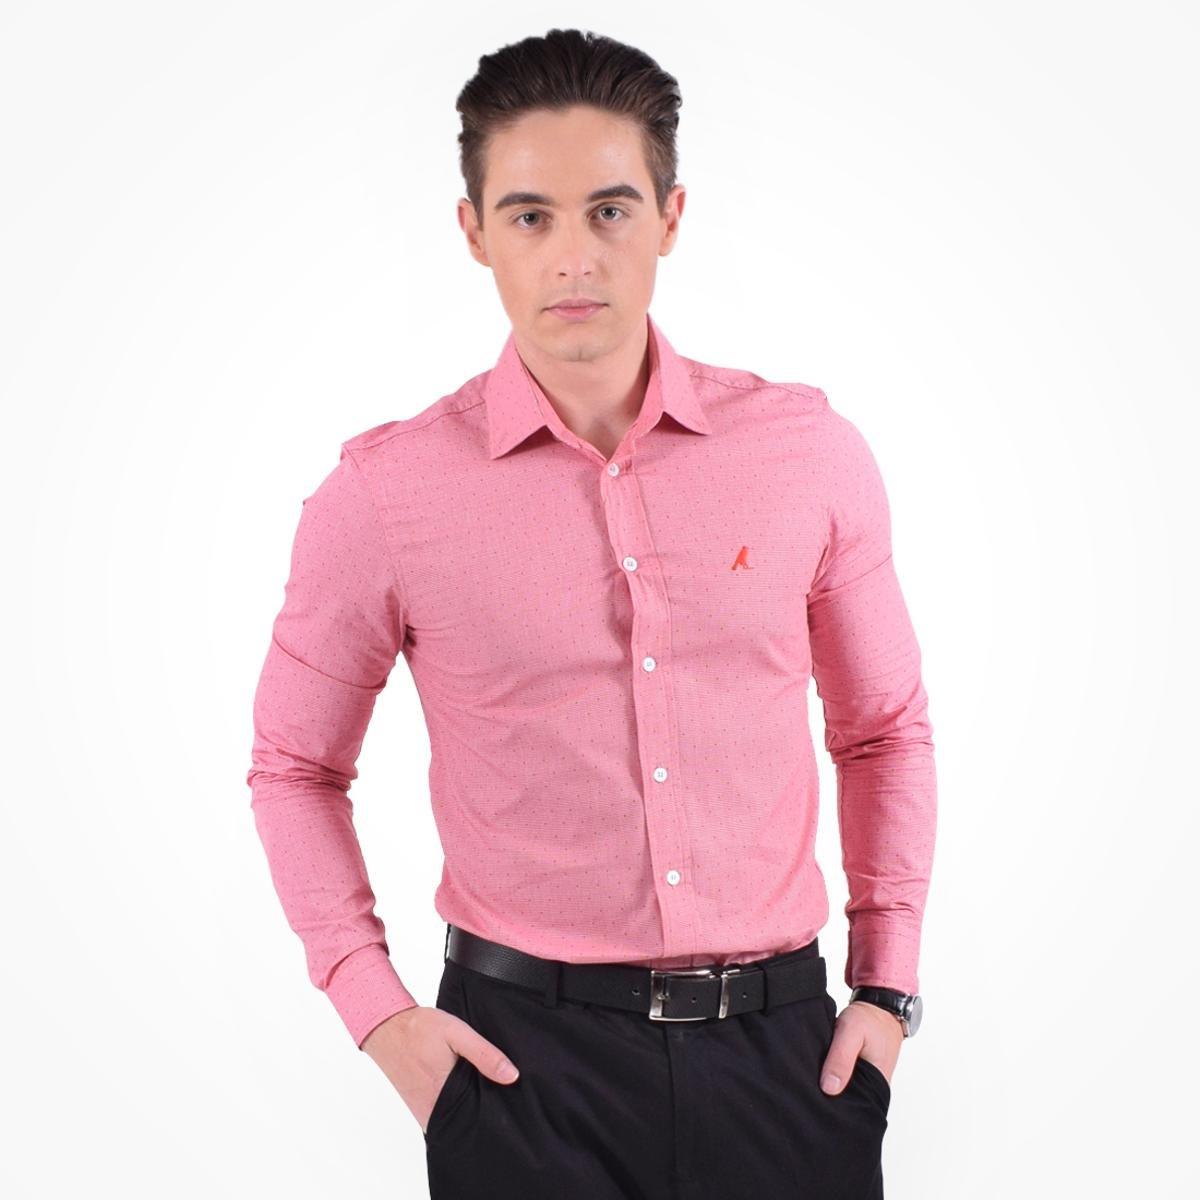 4cc28eac685ea Camisa Social Estampada Masculina - Slim - Rosa - Compre Agora   Zattini